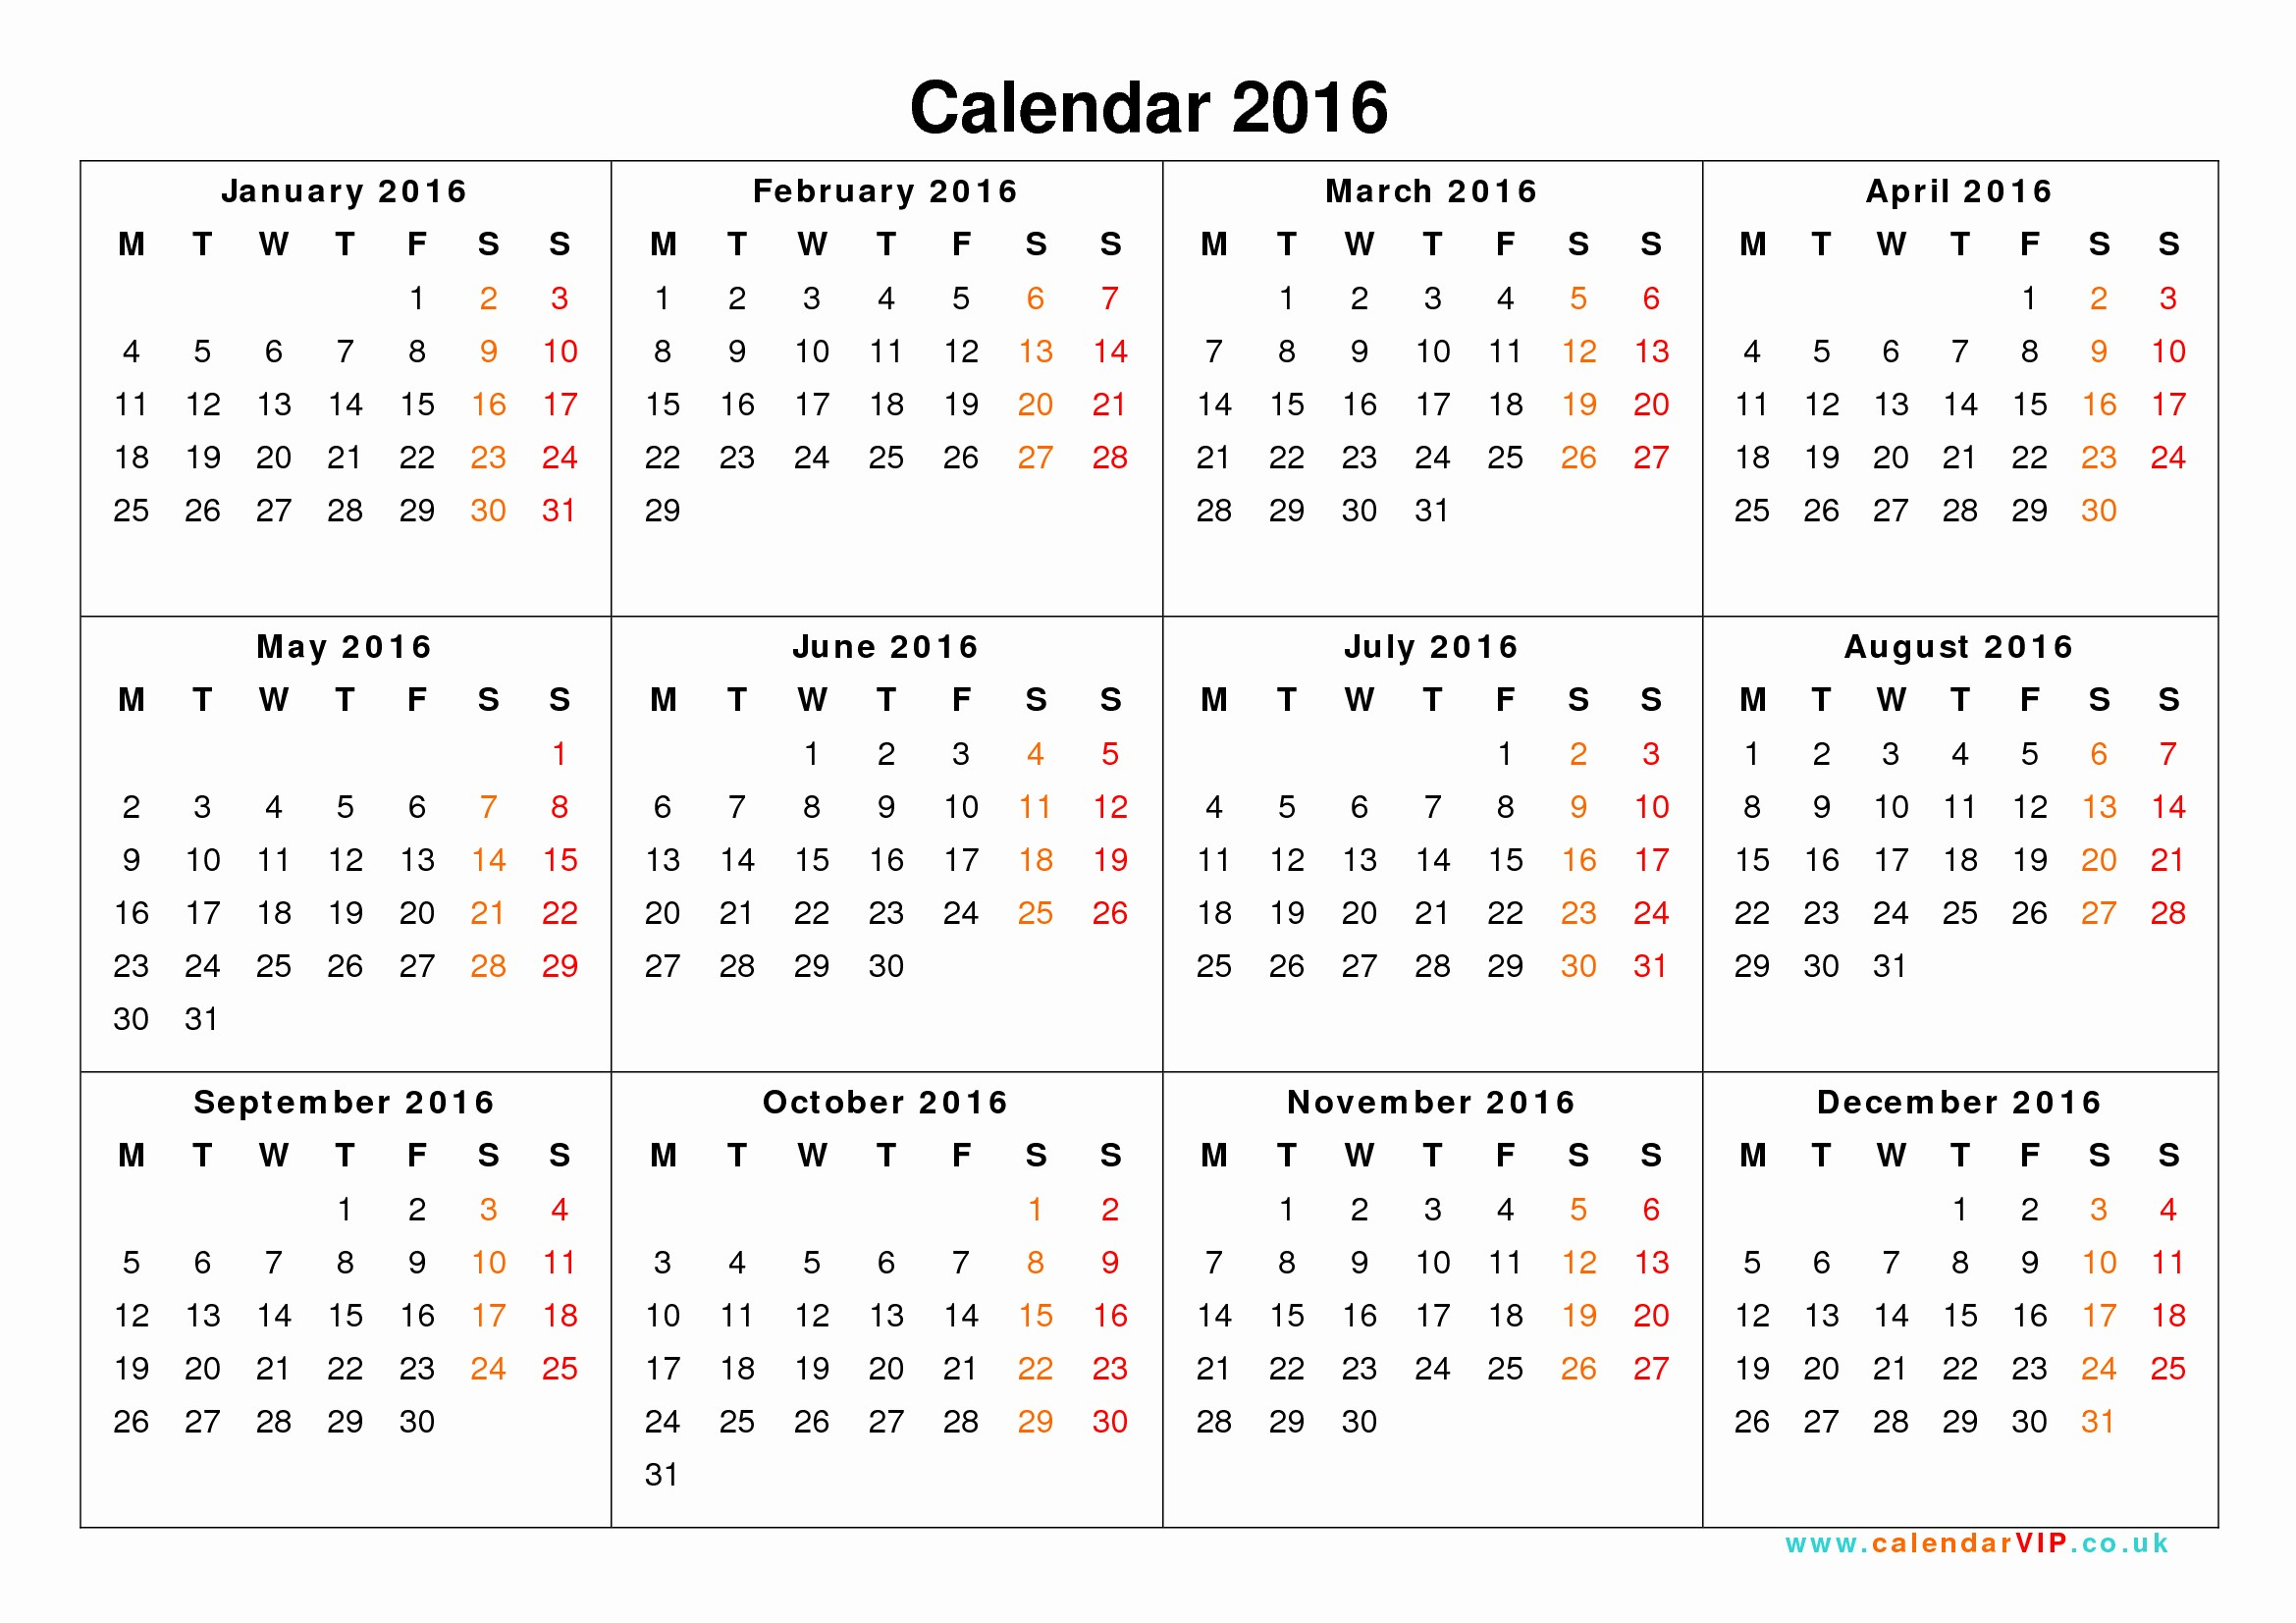 12 Months Calendar 2016 Printable Fresh Calendar 2016 Uk Free Yearly Calendar Templates for Uk